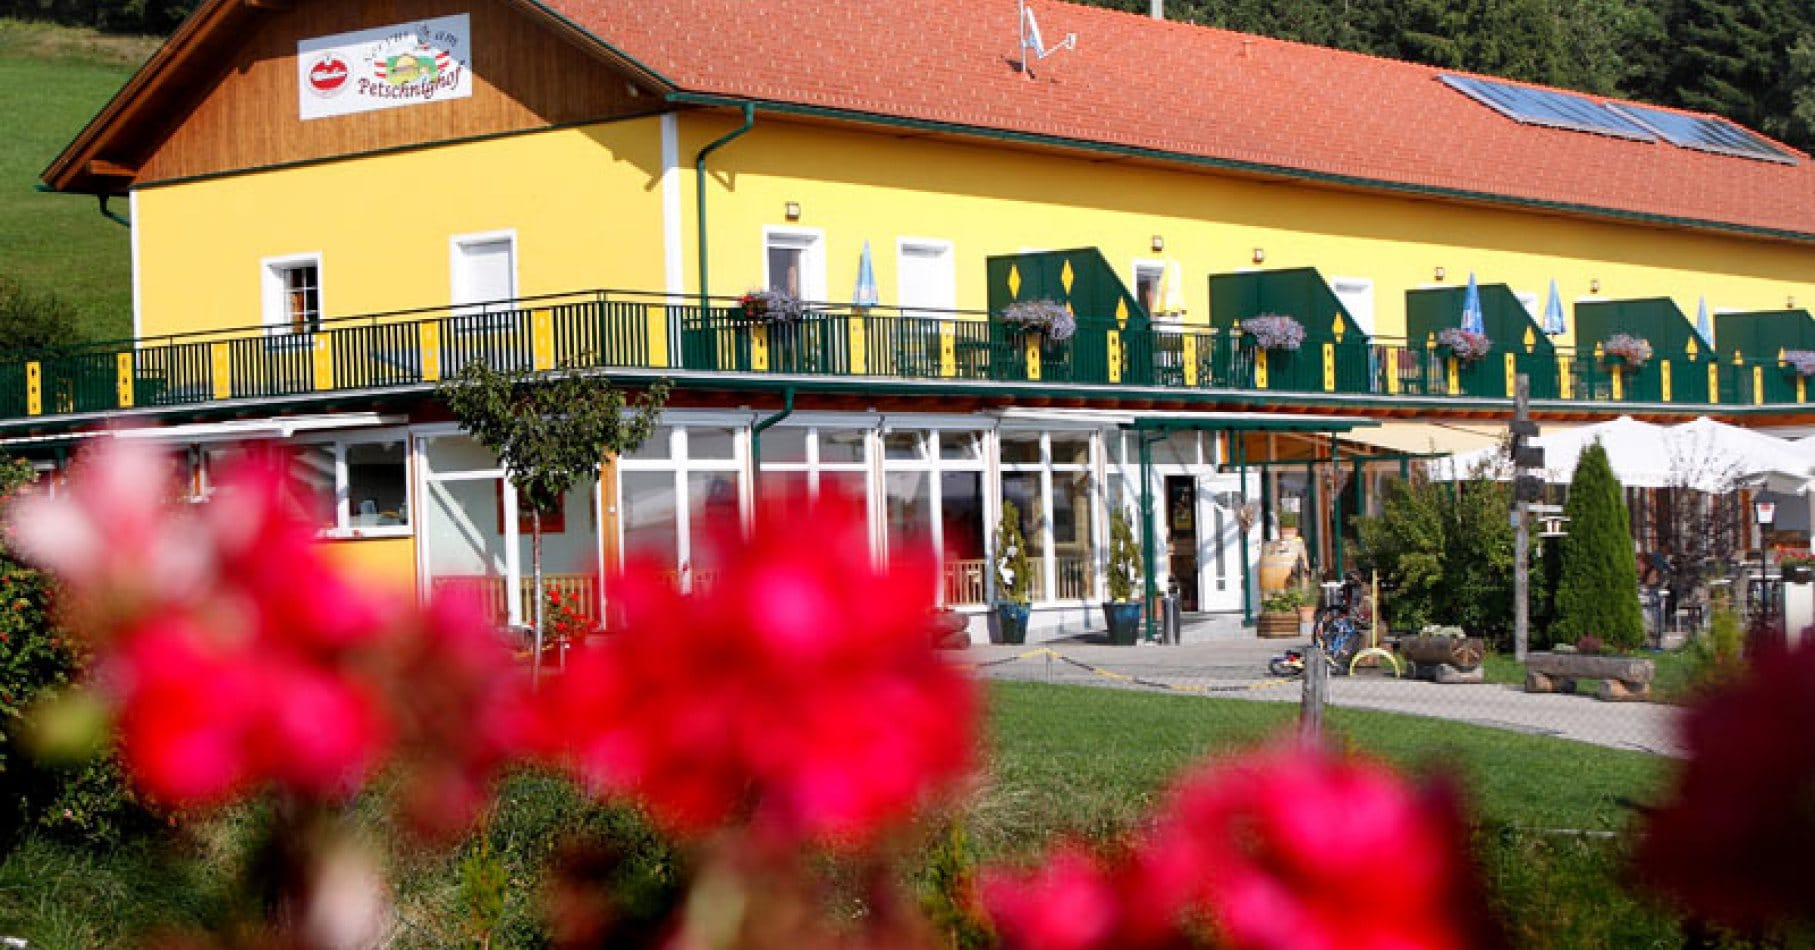 Petschnighof - family austria Familienhotels